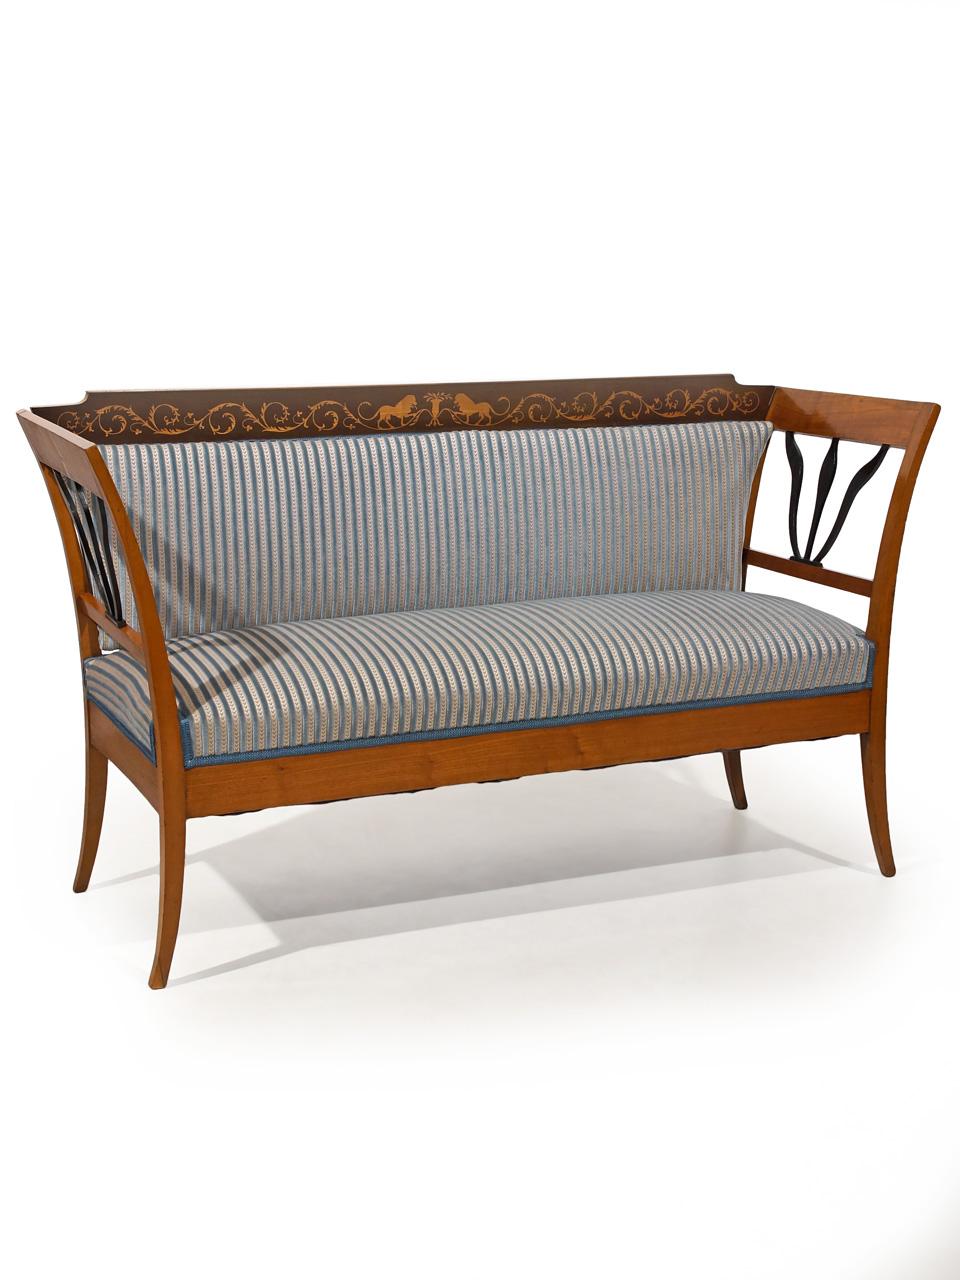 art nr 4319 sitzbank teils ebonisierte l wenverzierungen. Black Bedroom Furniture Sets. Home Design Ideas